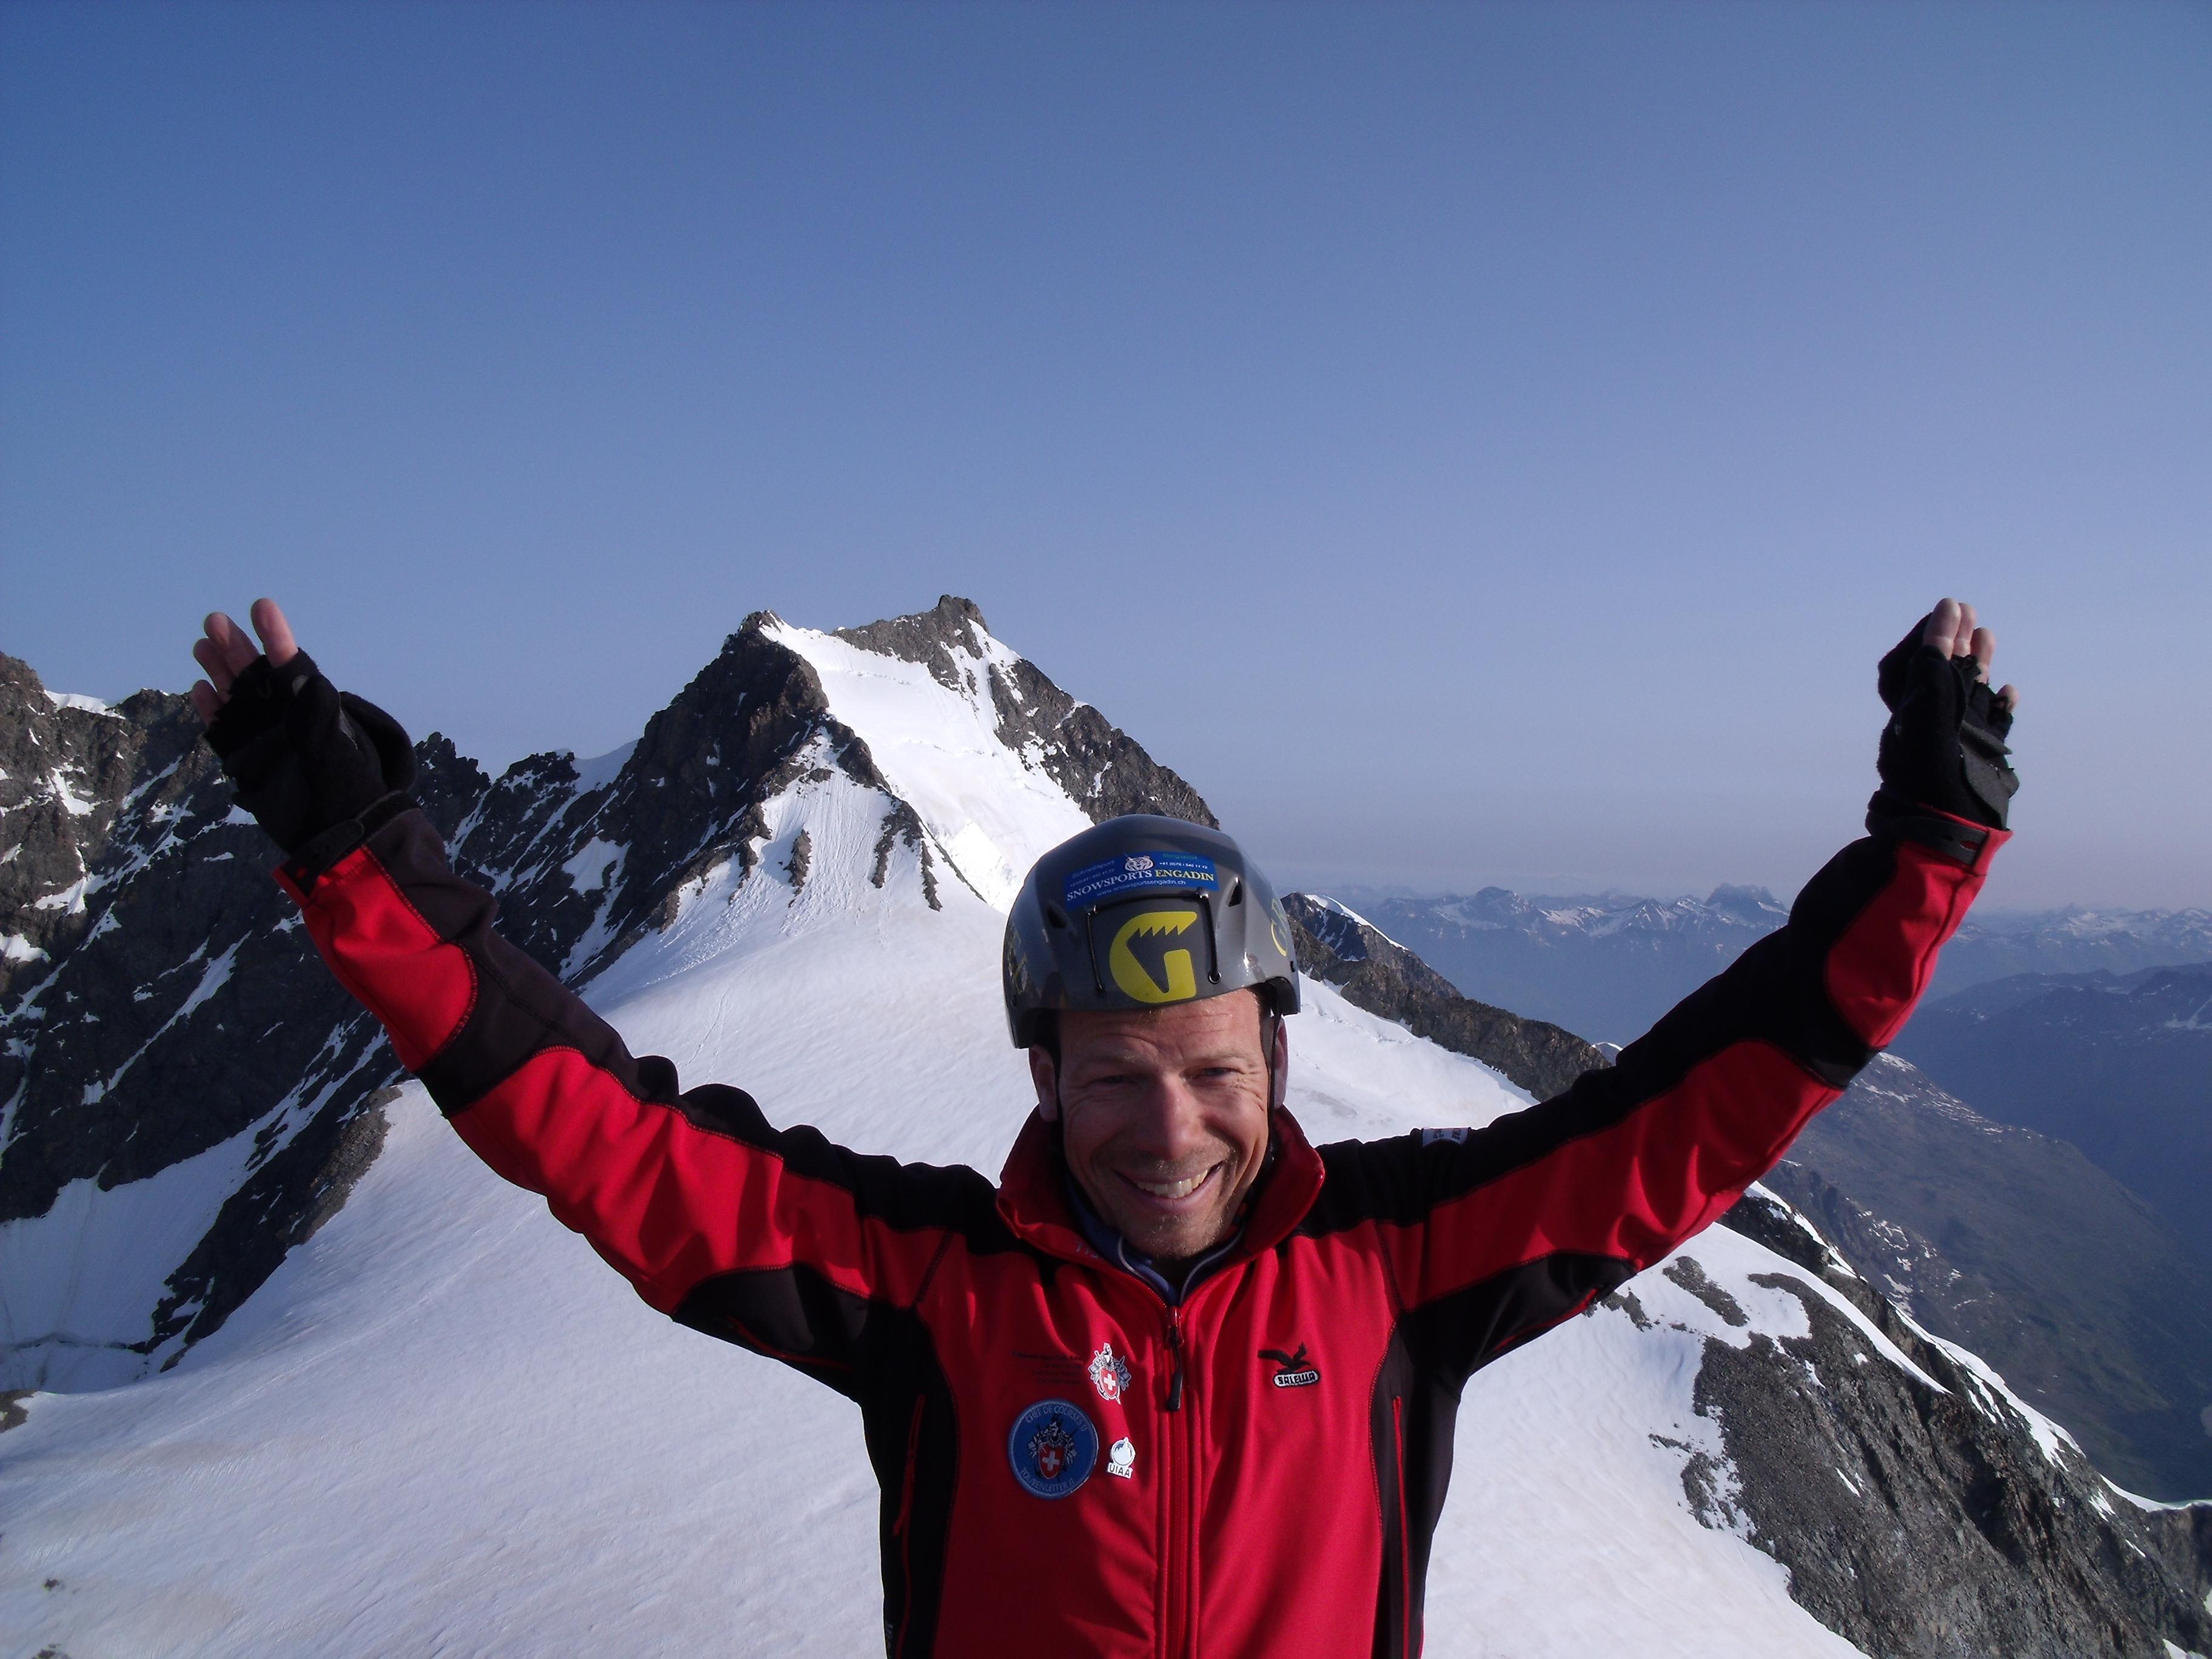 Langlaufschule Bär Snowsports Engadin Slide 1